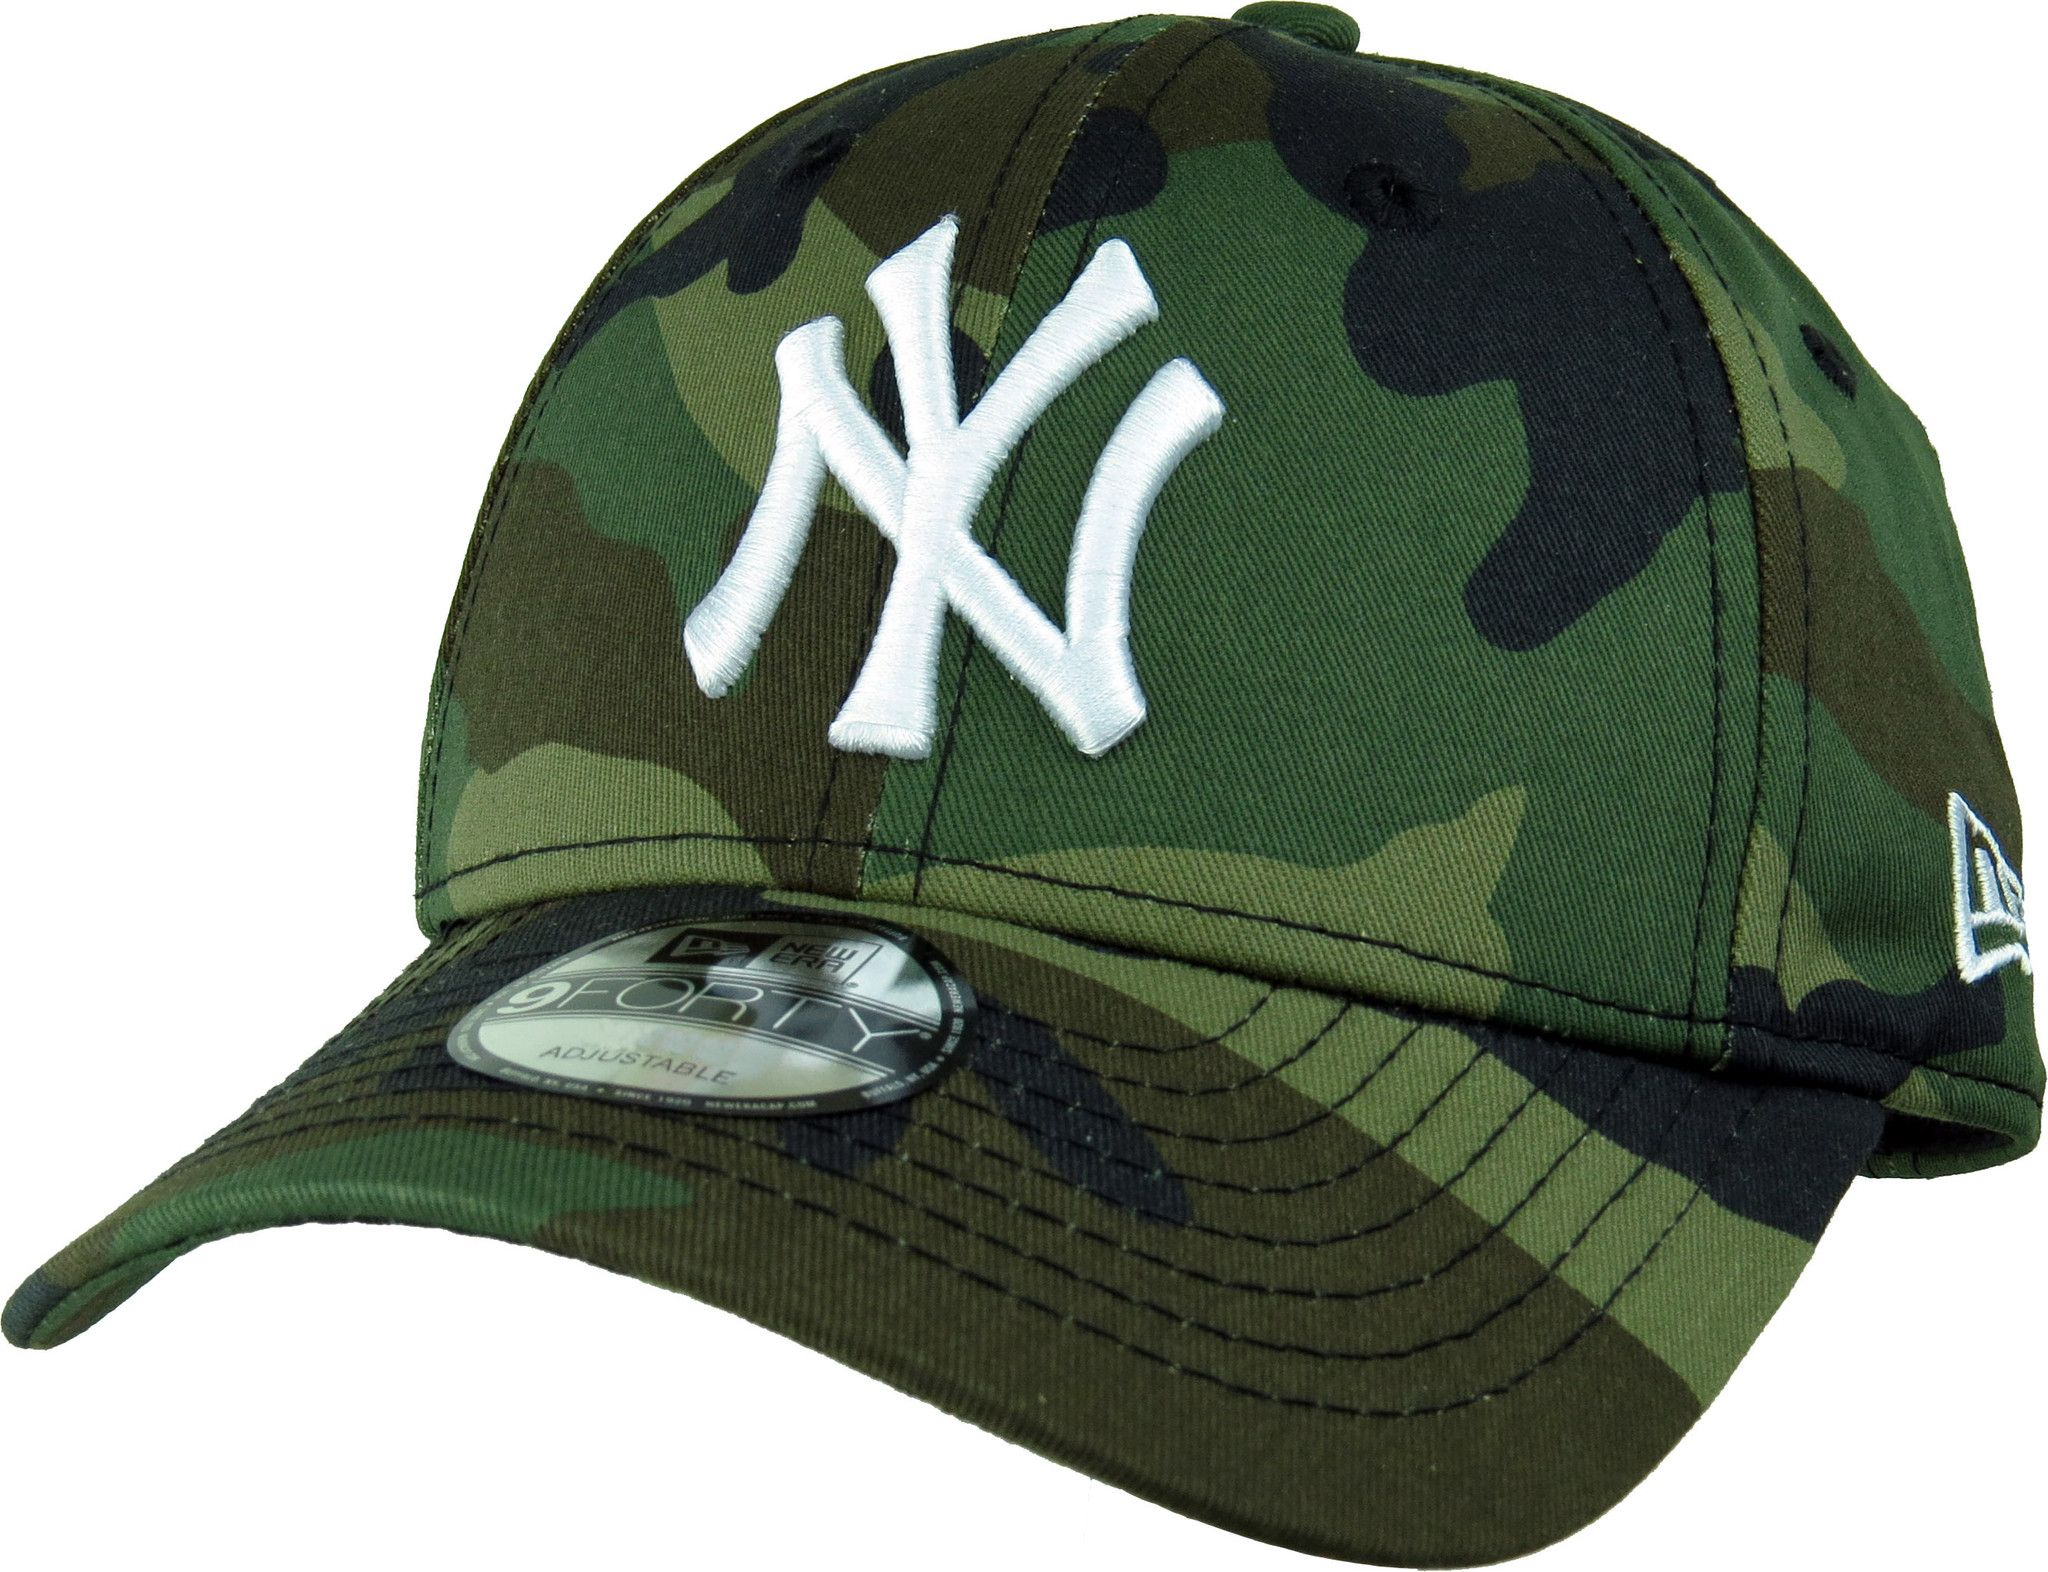 New Era 940 League Essential Ny Yankees Baseball Cap Woodland Camo With The White Ny New York Yankees Front Logo A Gorra De Beisbol Gorras Equipos De Beisbol